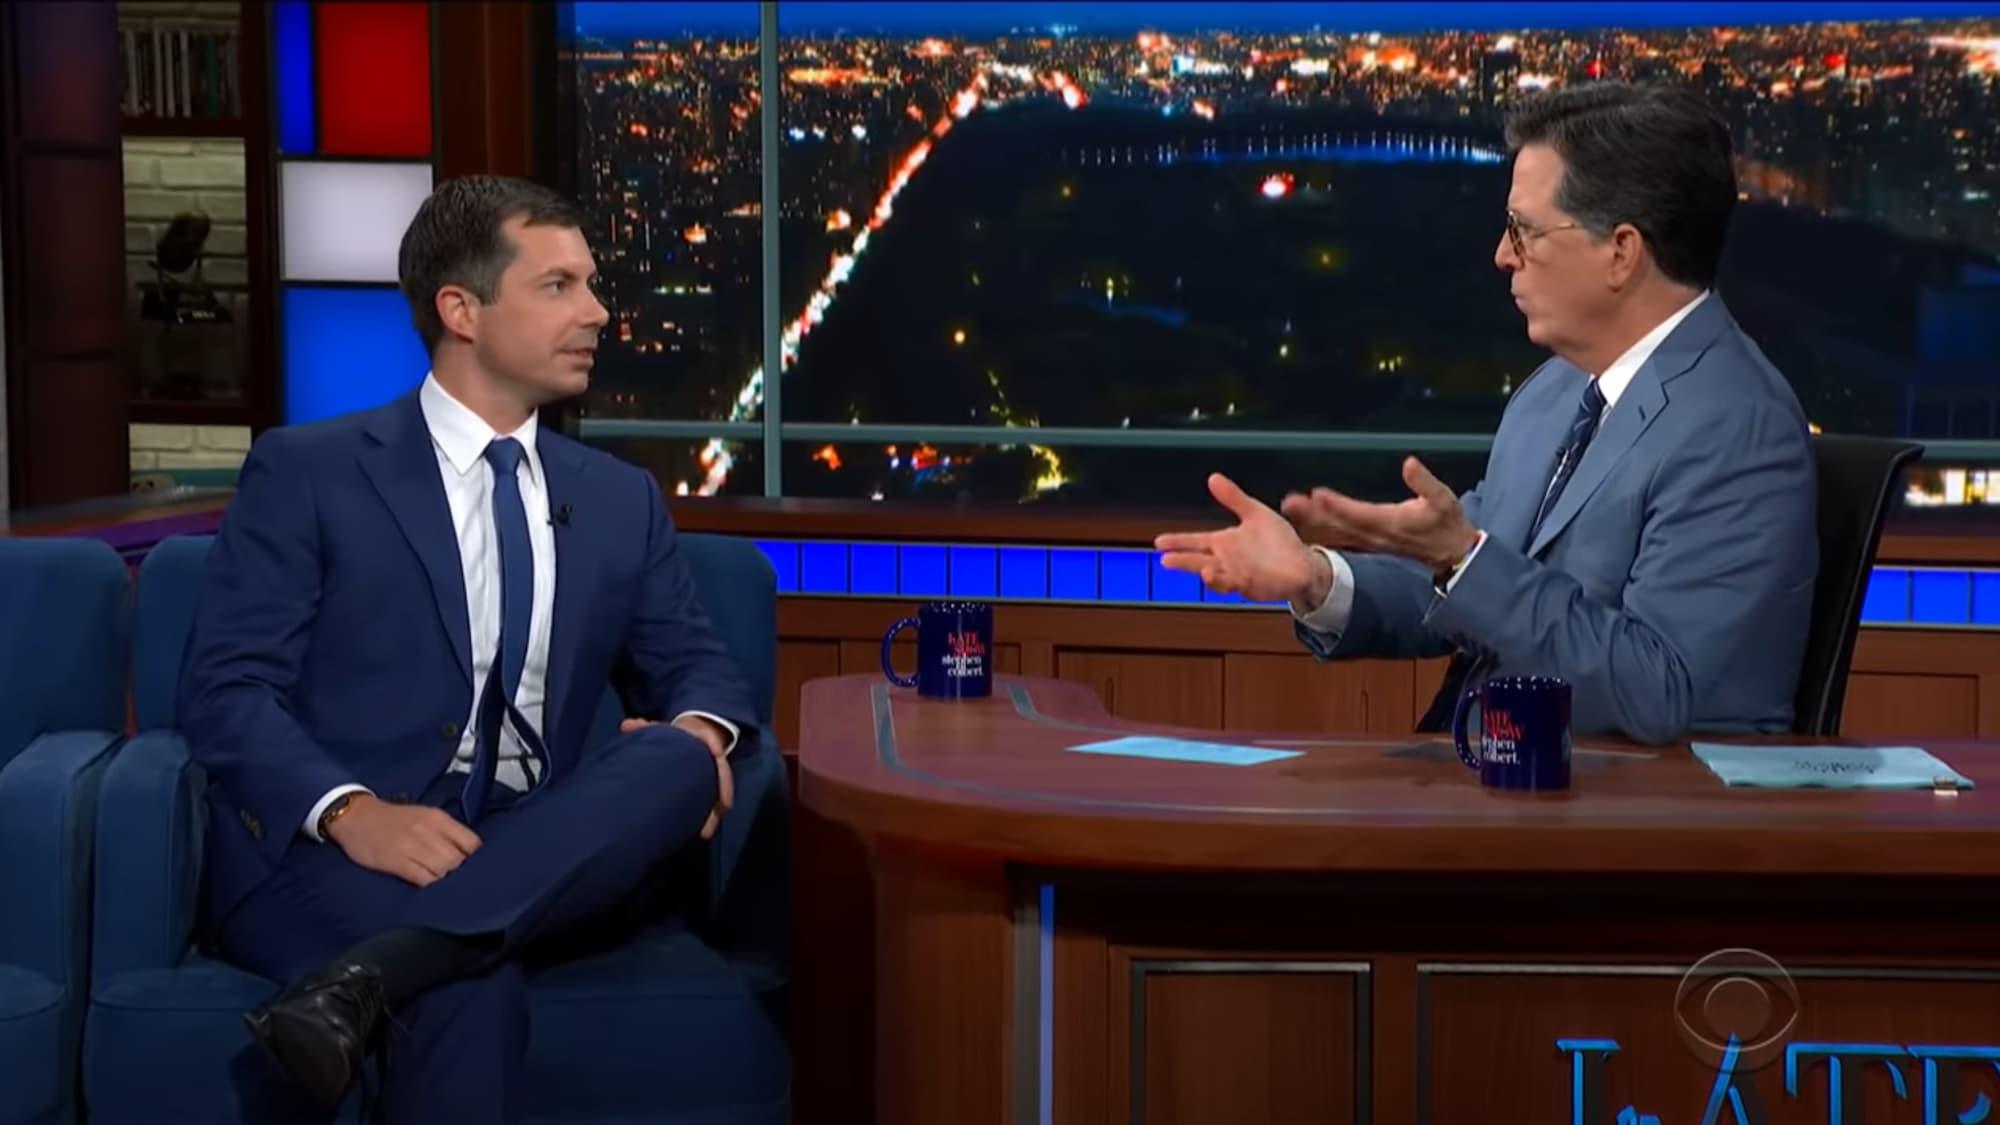 U.S. Secretary of Transportation Pete Buttigieg, Stephen Colbert, The Late Show with Stephen Colbert,